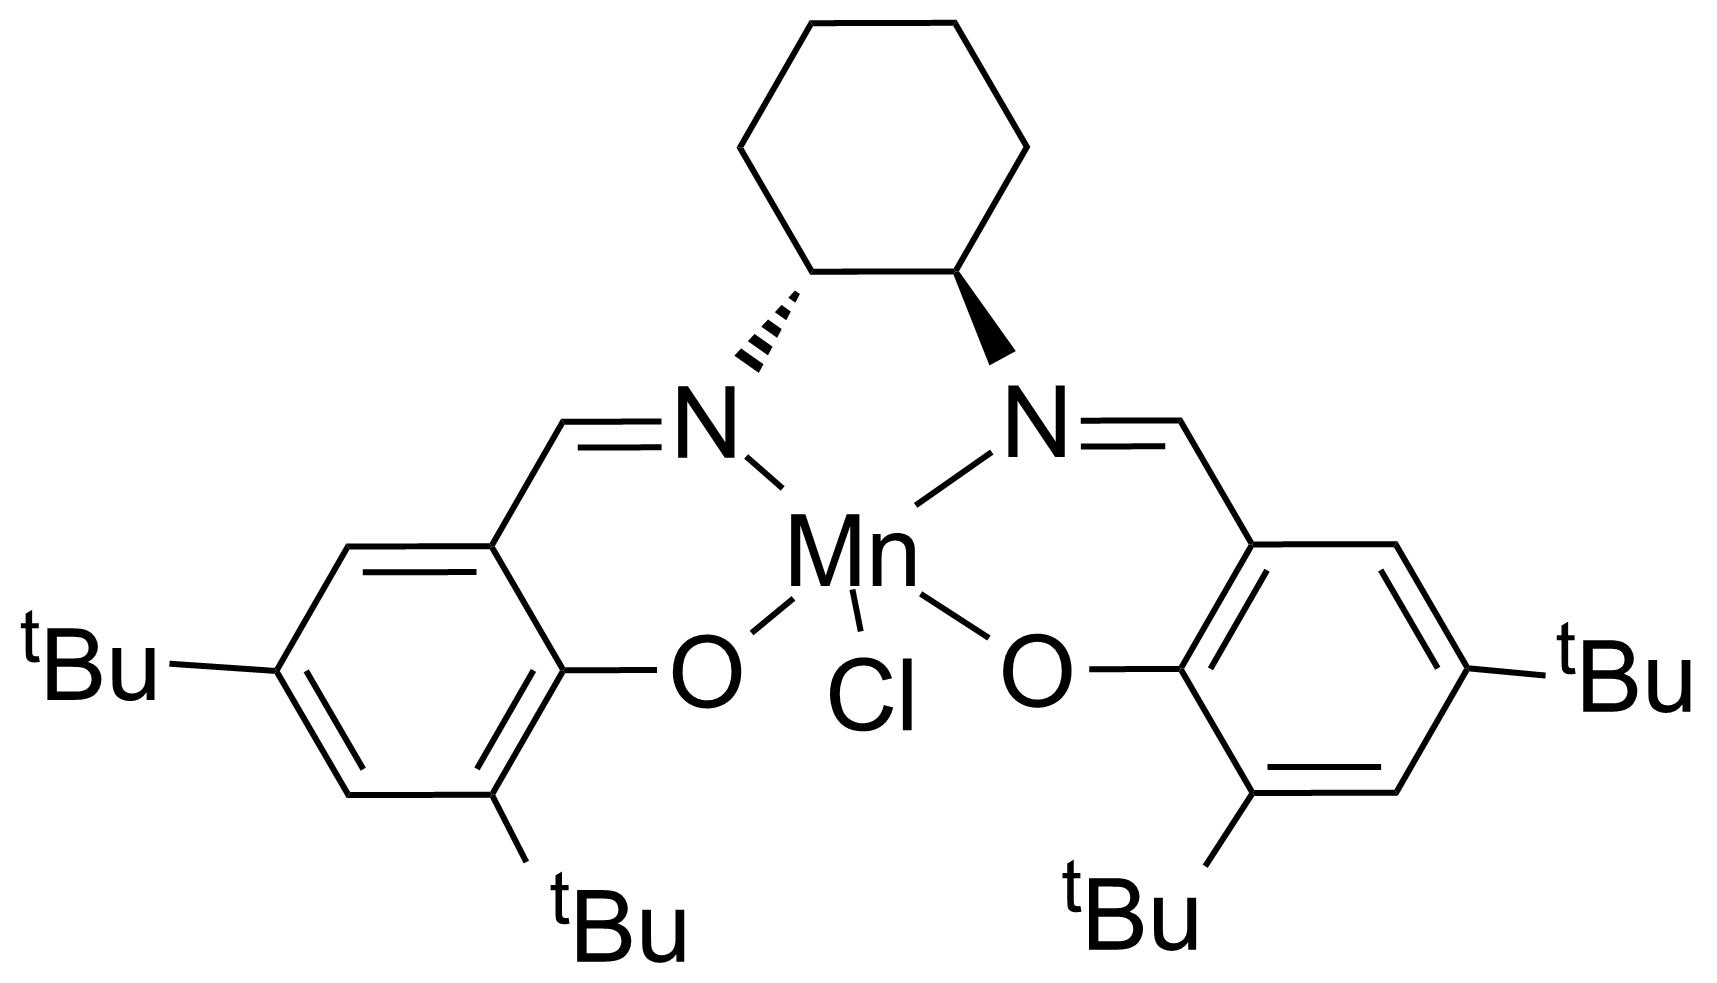 Structure of (R,R)-(-)-N,N'-Bis(3,5-di-tert-butylsalicylidene)-1,2-cyclohexanediaminomanganese(III) chloride